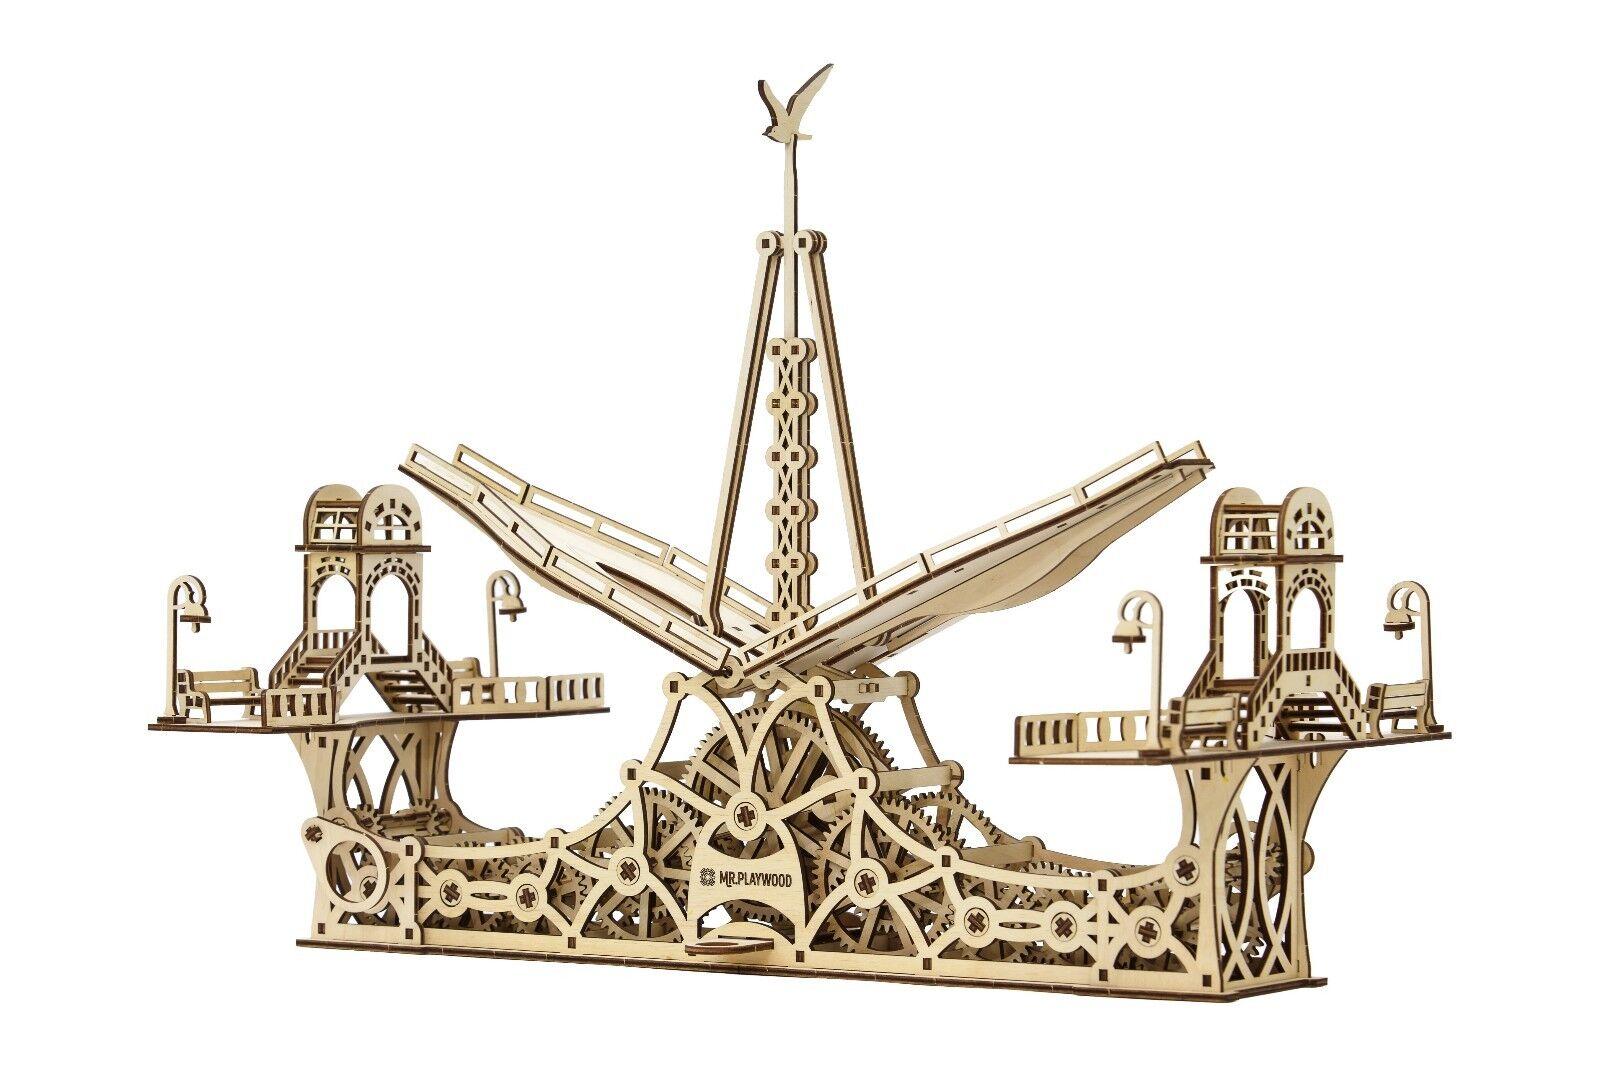 PEDESTRIAN BRIDGE - MrPLAYWOOD - 3D Mechanical Wooden Model & Puzzle